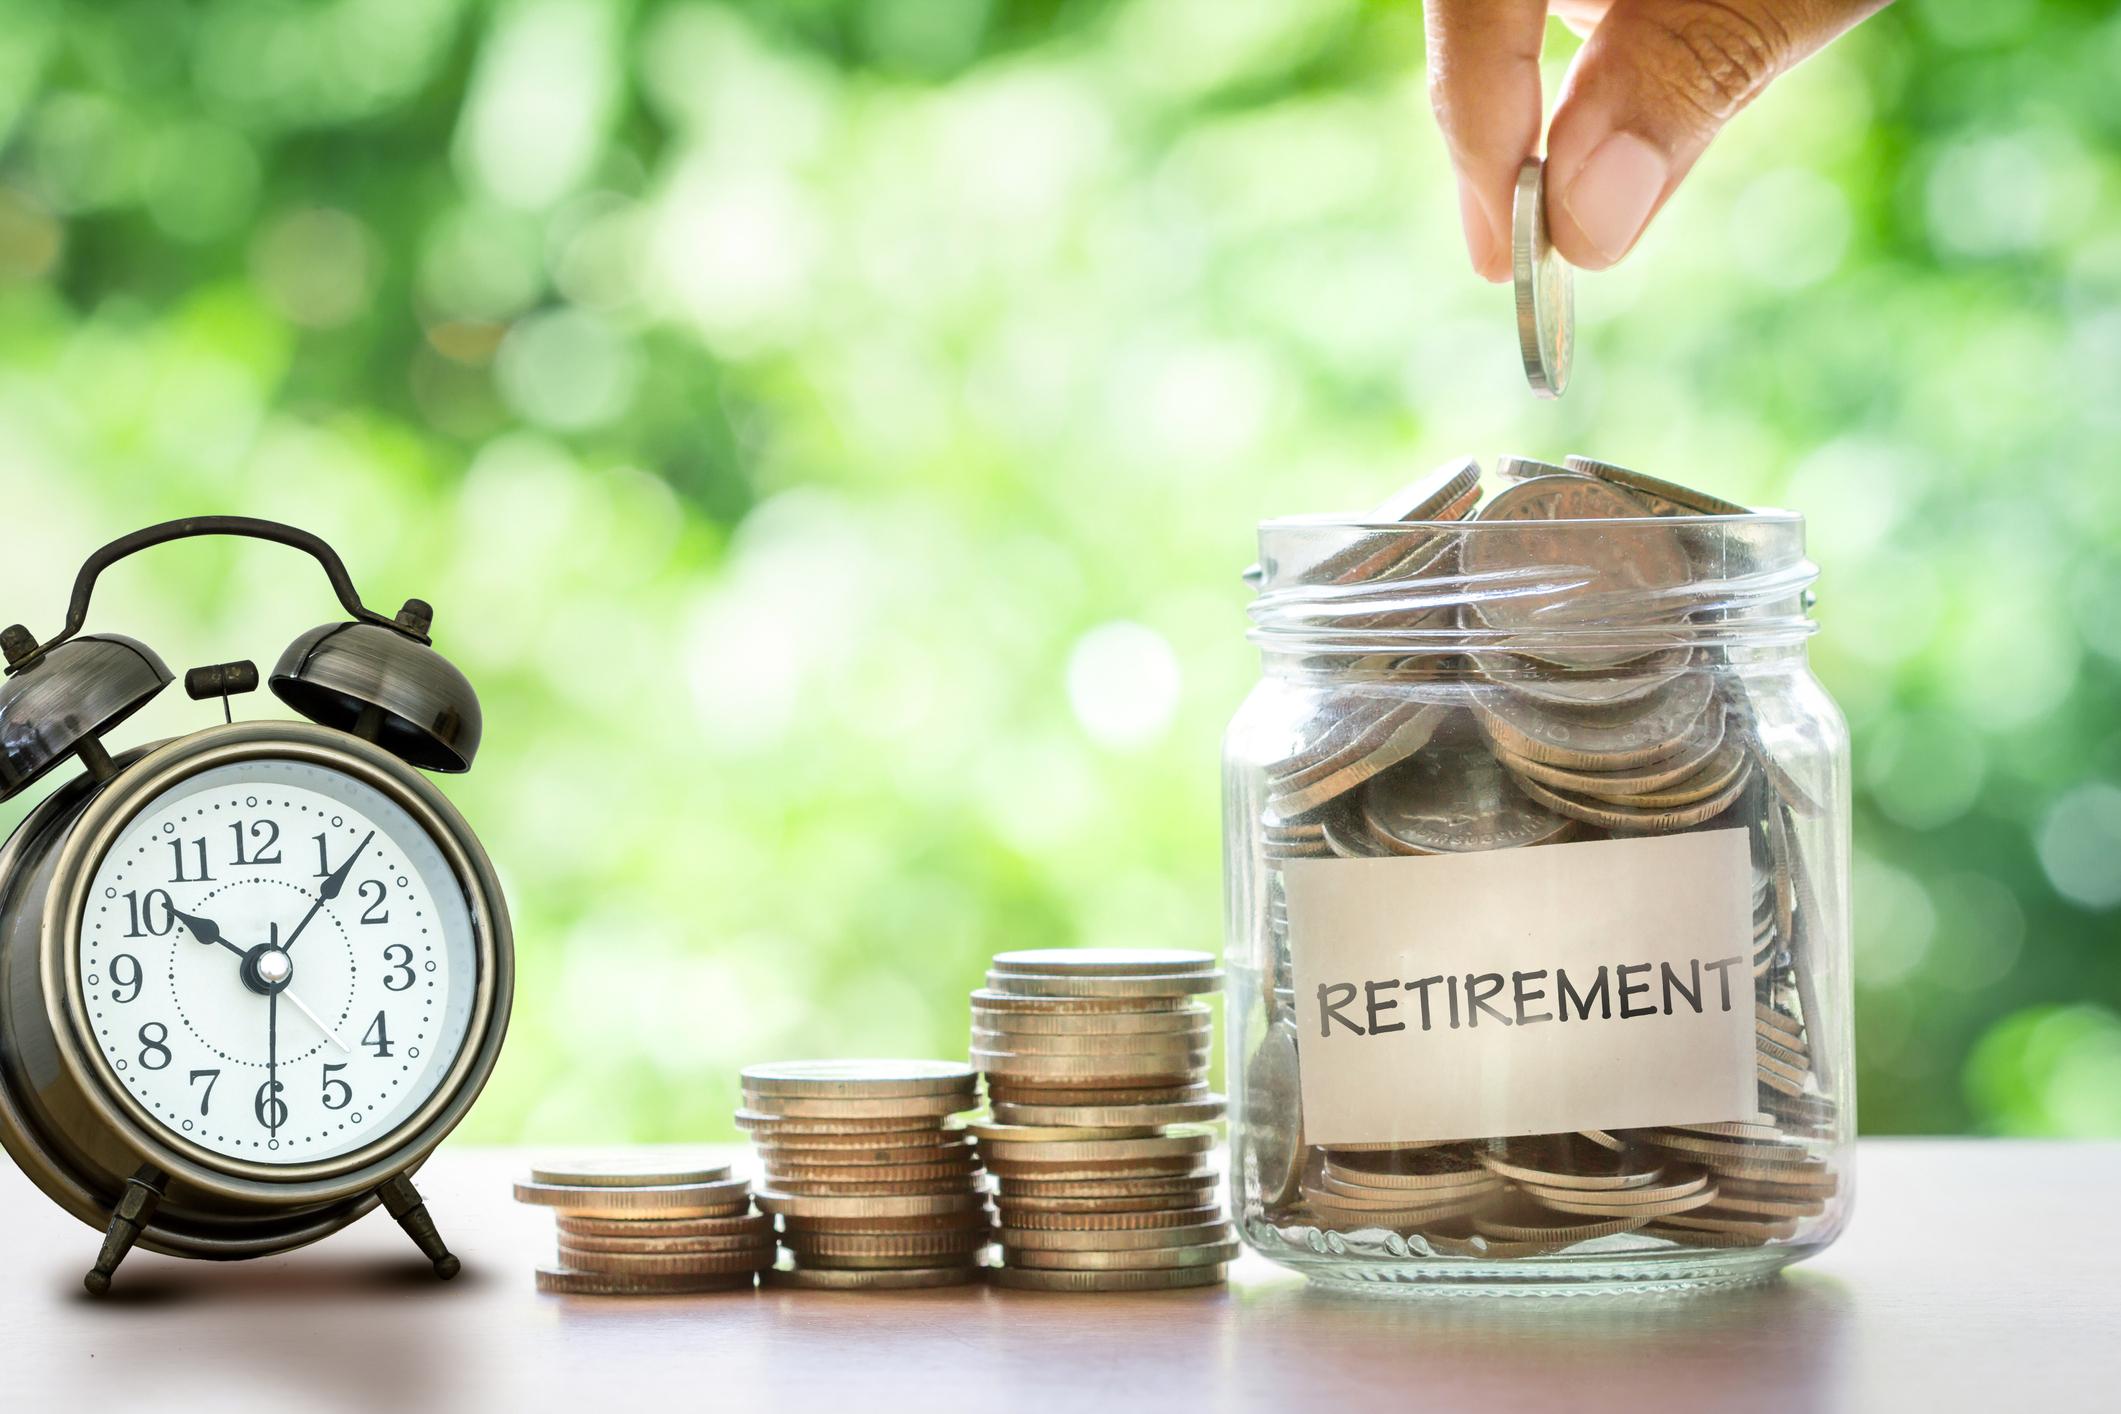 Retirement savings jar next to smaller piles of coins and an alarm clock